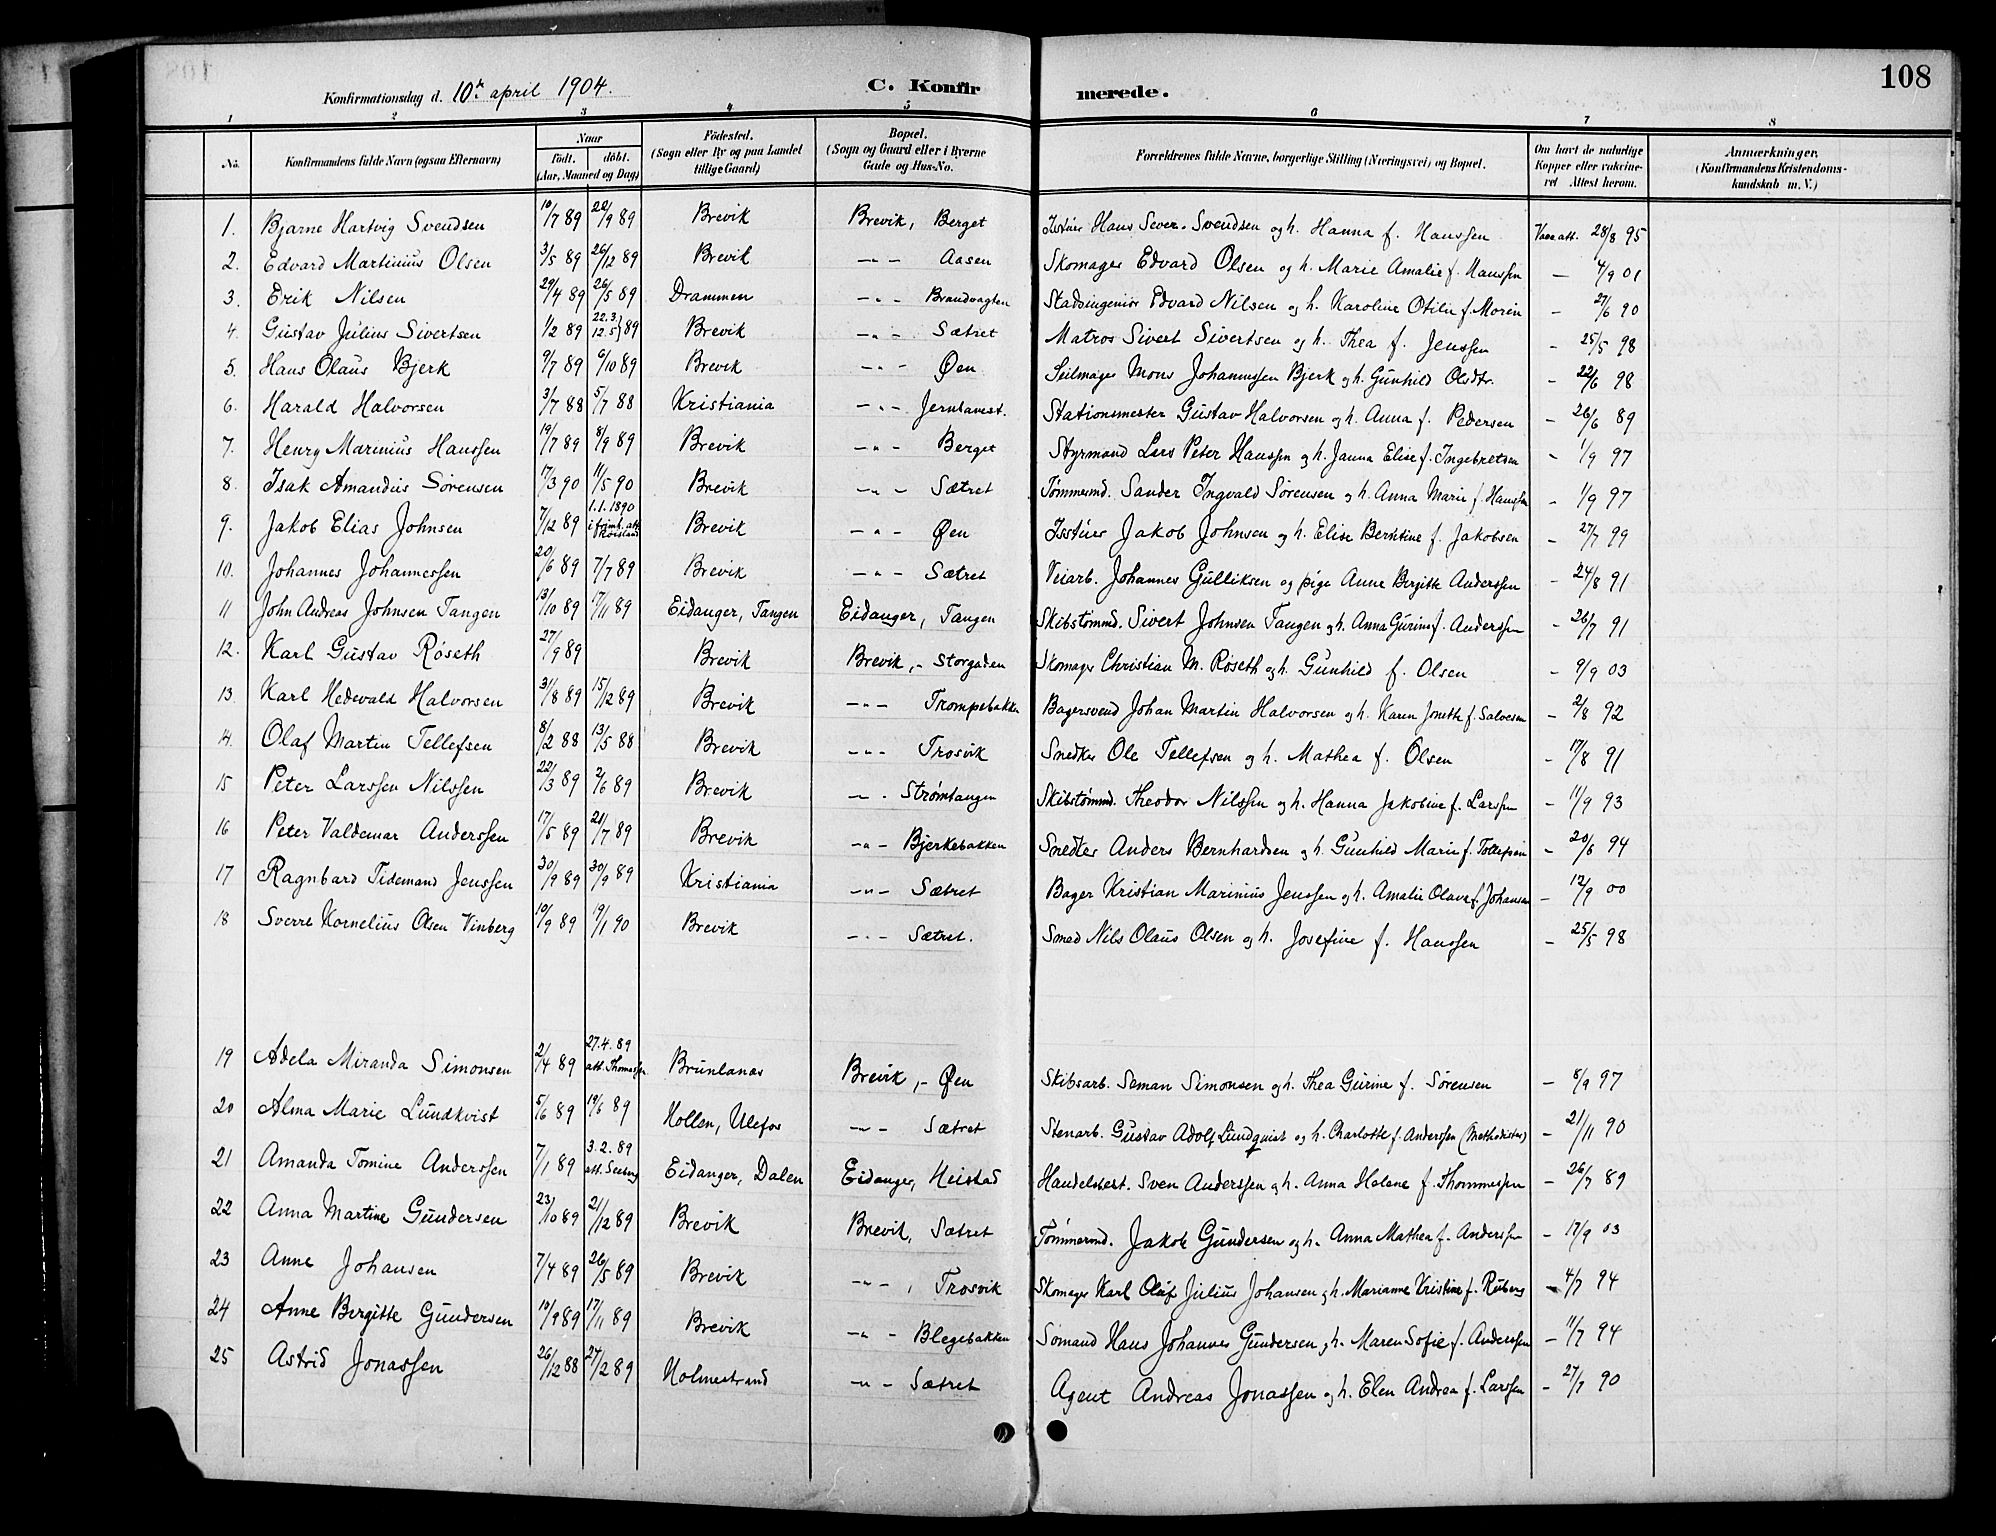 SAKO, Brevik kirkebøker, G/Ga/L0005: Klokkerbok nr. 5, 1901-1924, s. 108